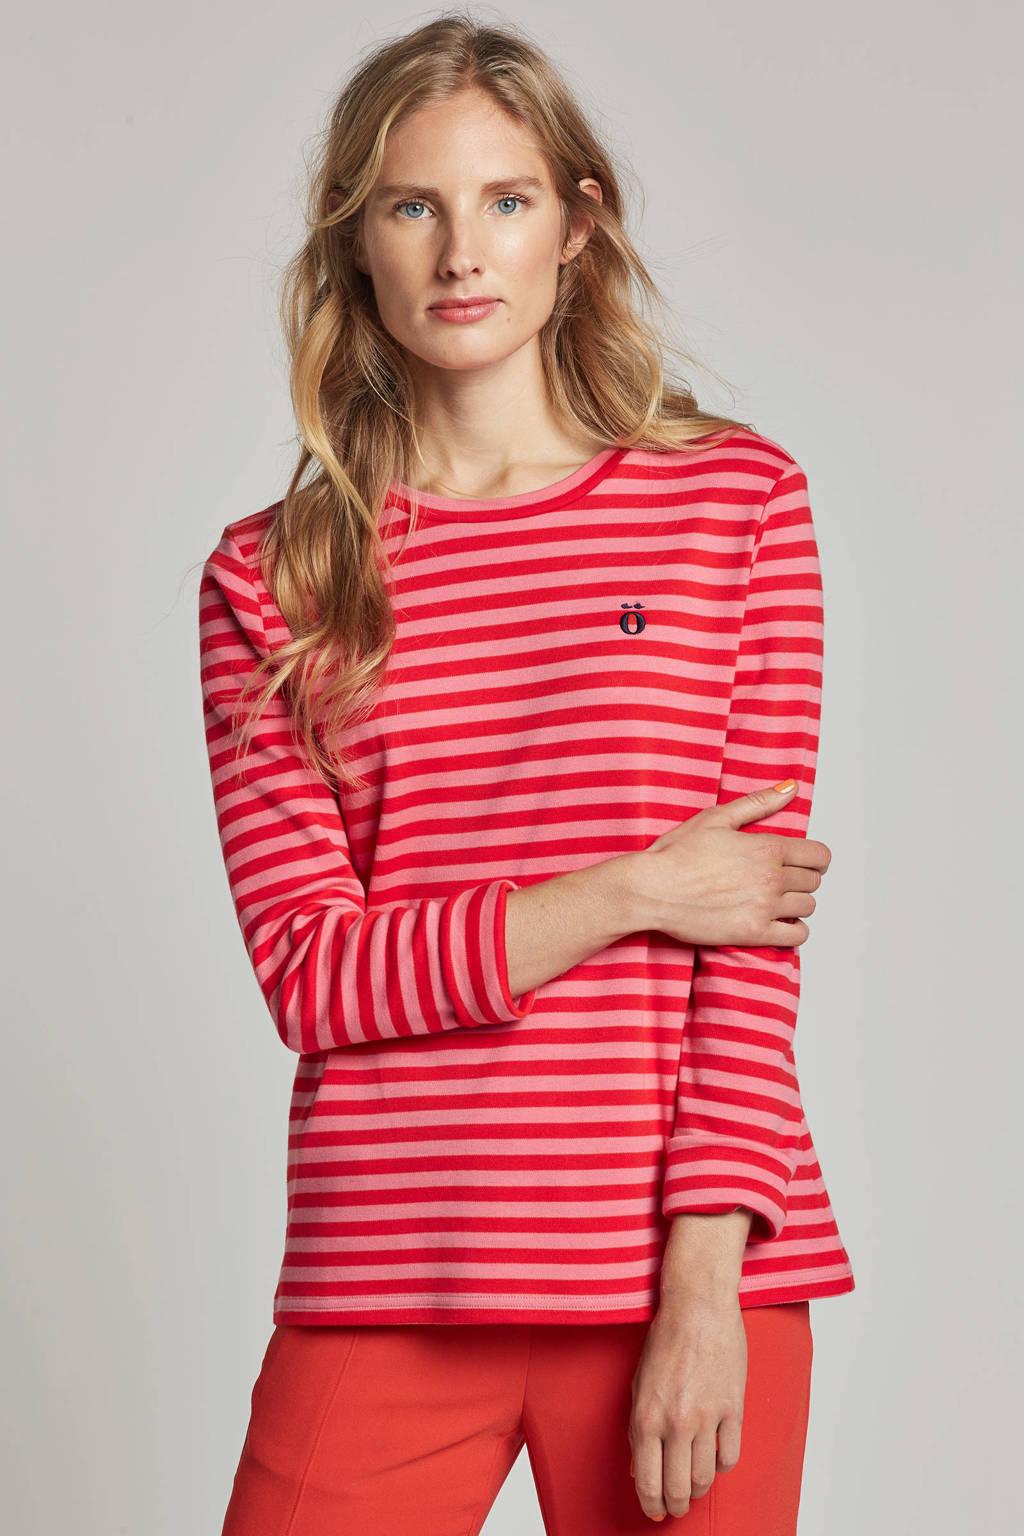 Modström Noir T-shirt met streepdessin, Roze/rood